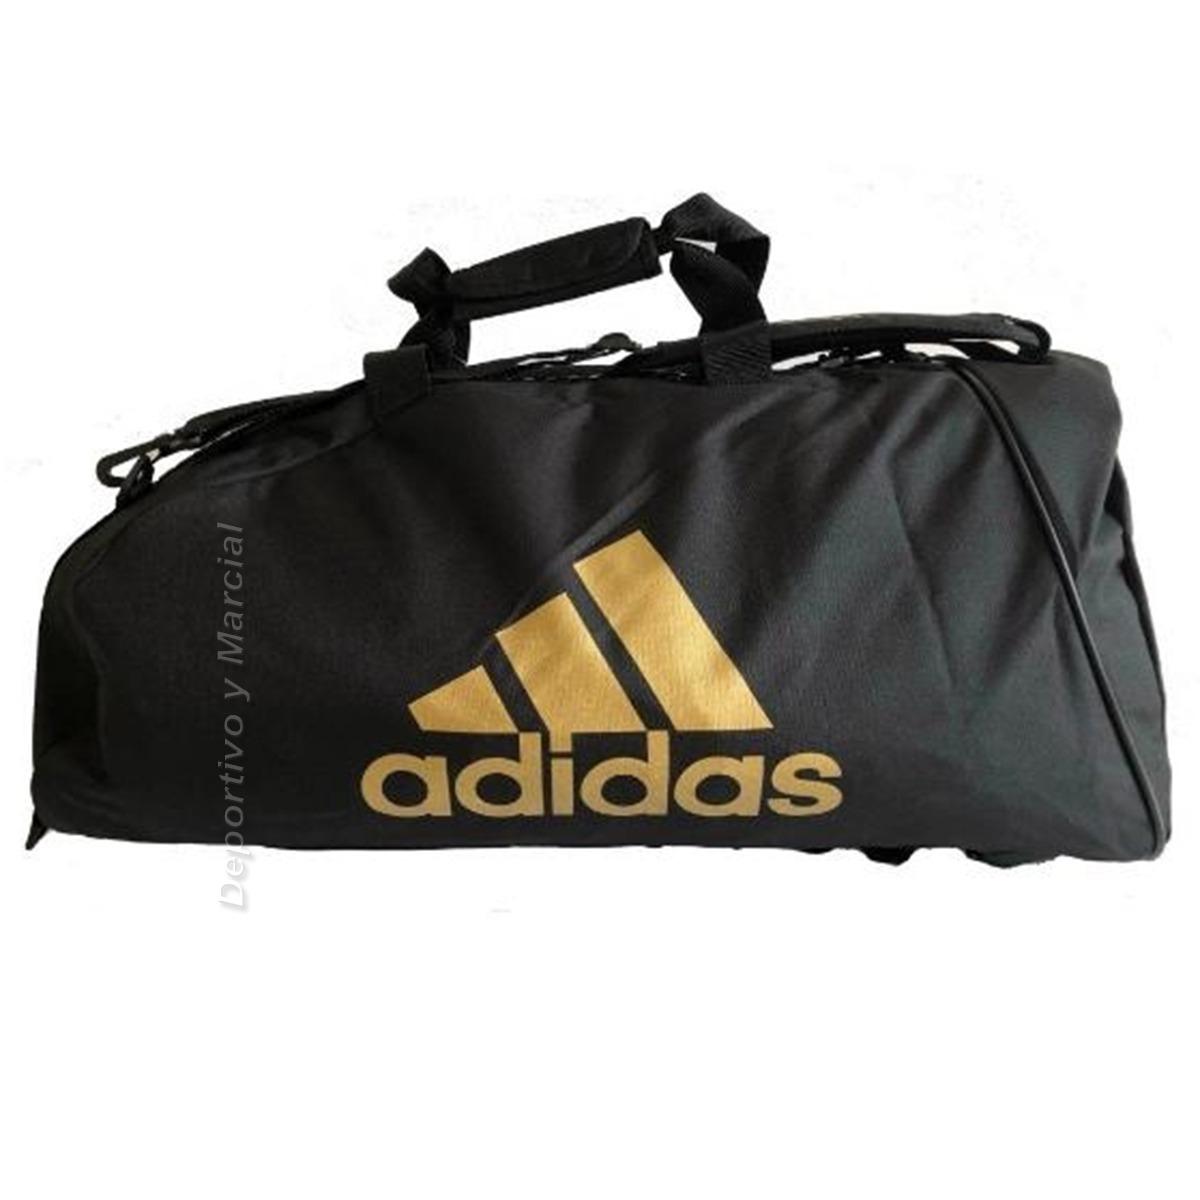 a9f3527901b6f bolso mochila adidas deportivo training 40 litros original. Cargando zoom.